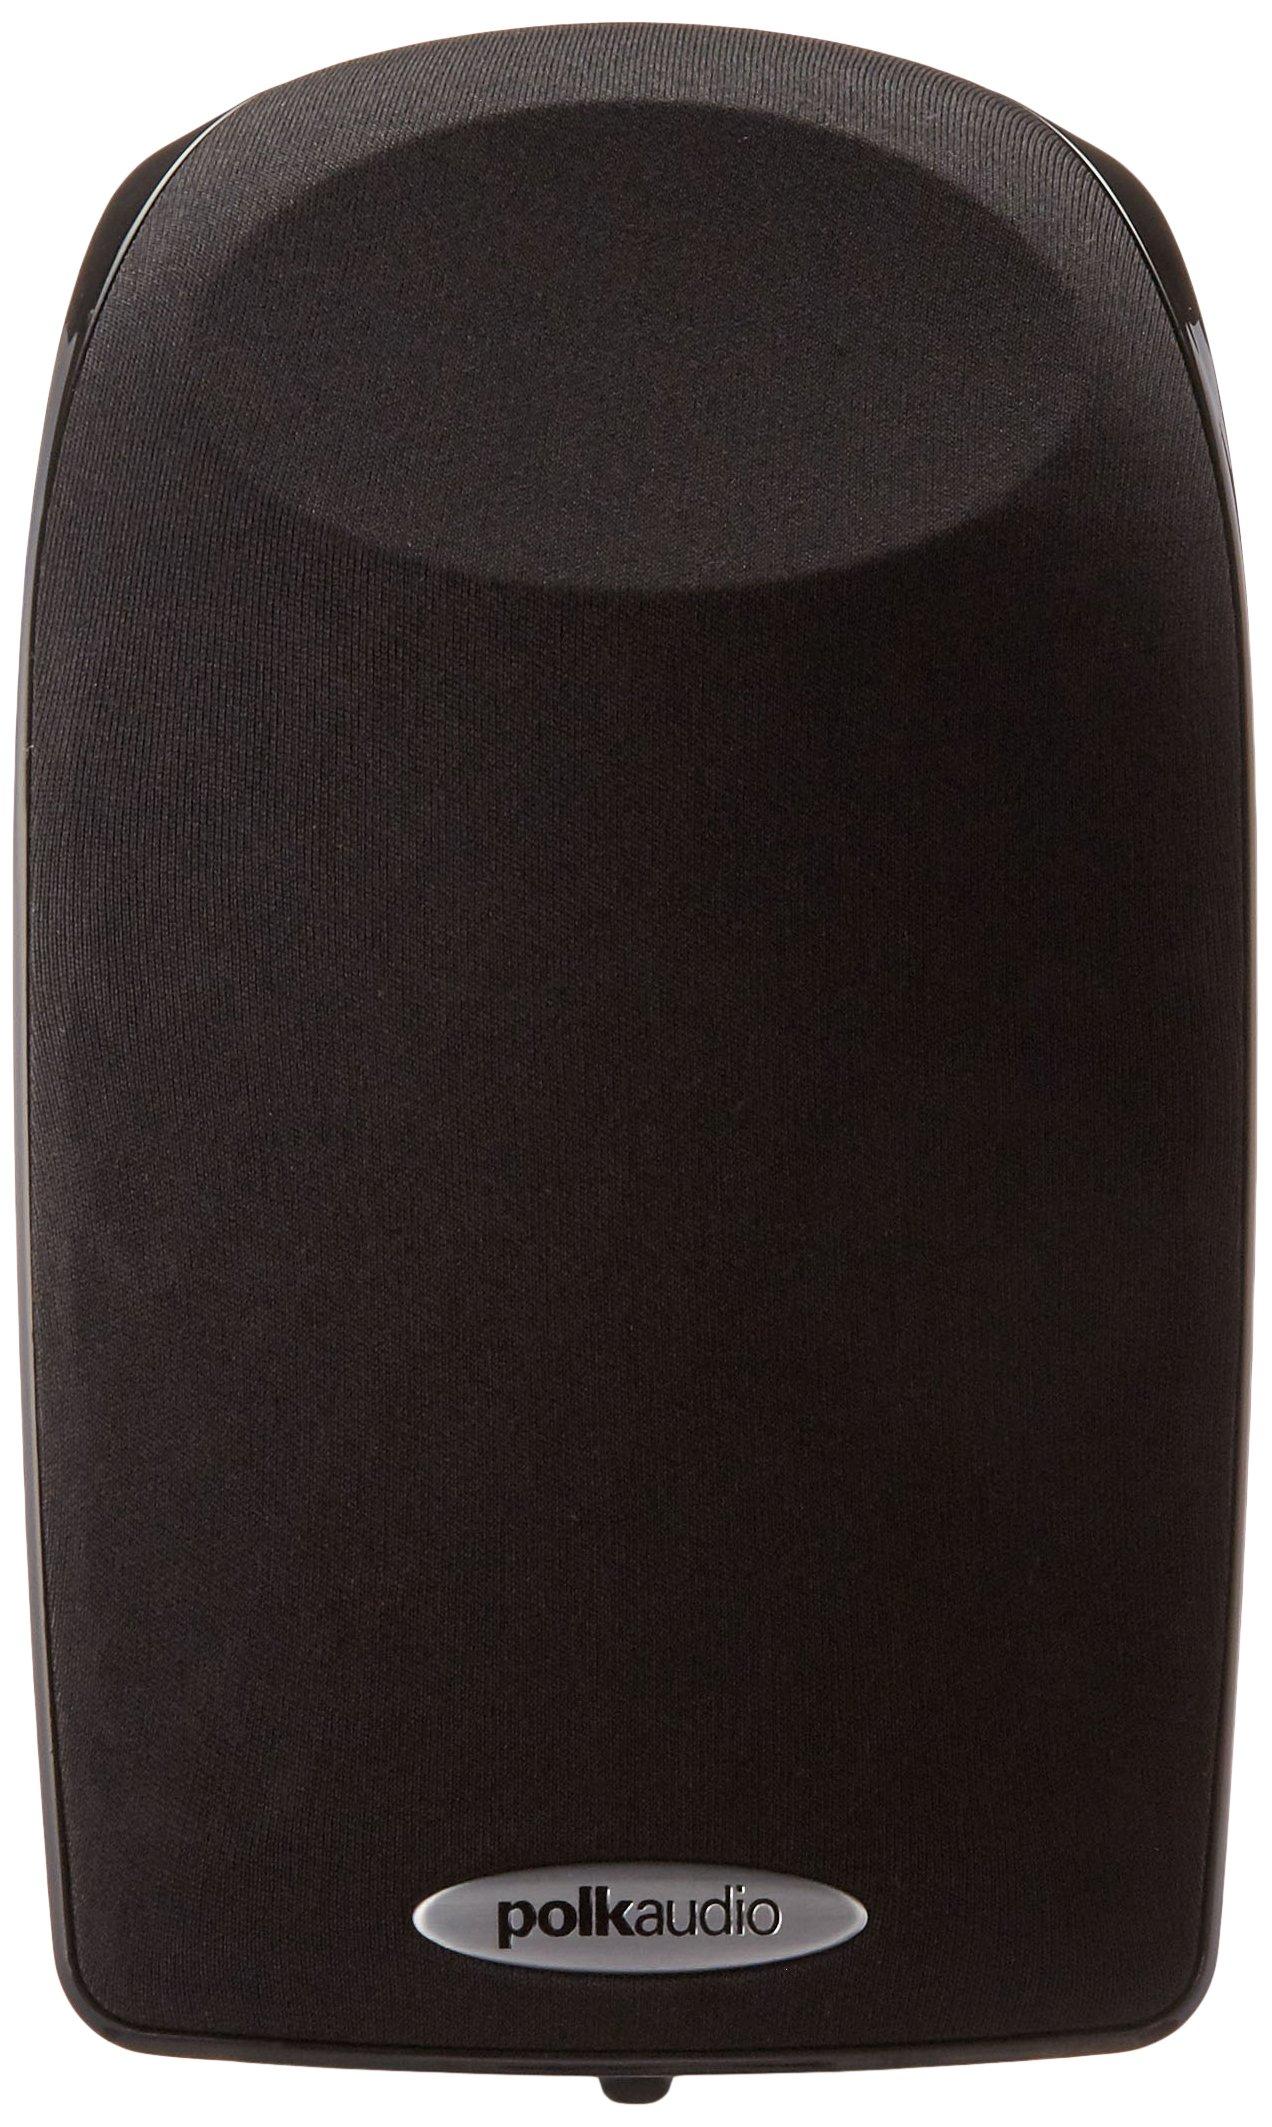 Polk Audio TL3 High Performance Satellite Speaker - Black, Single speaker - Priced and sold individually by Polk Audio